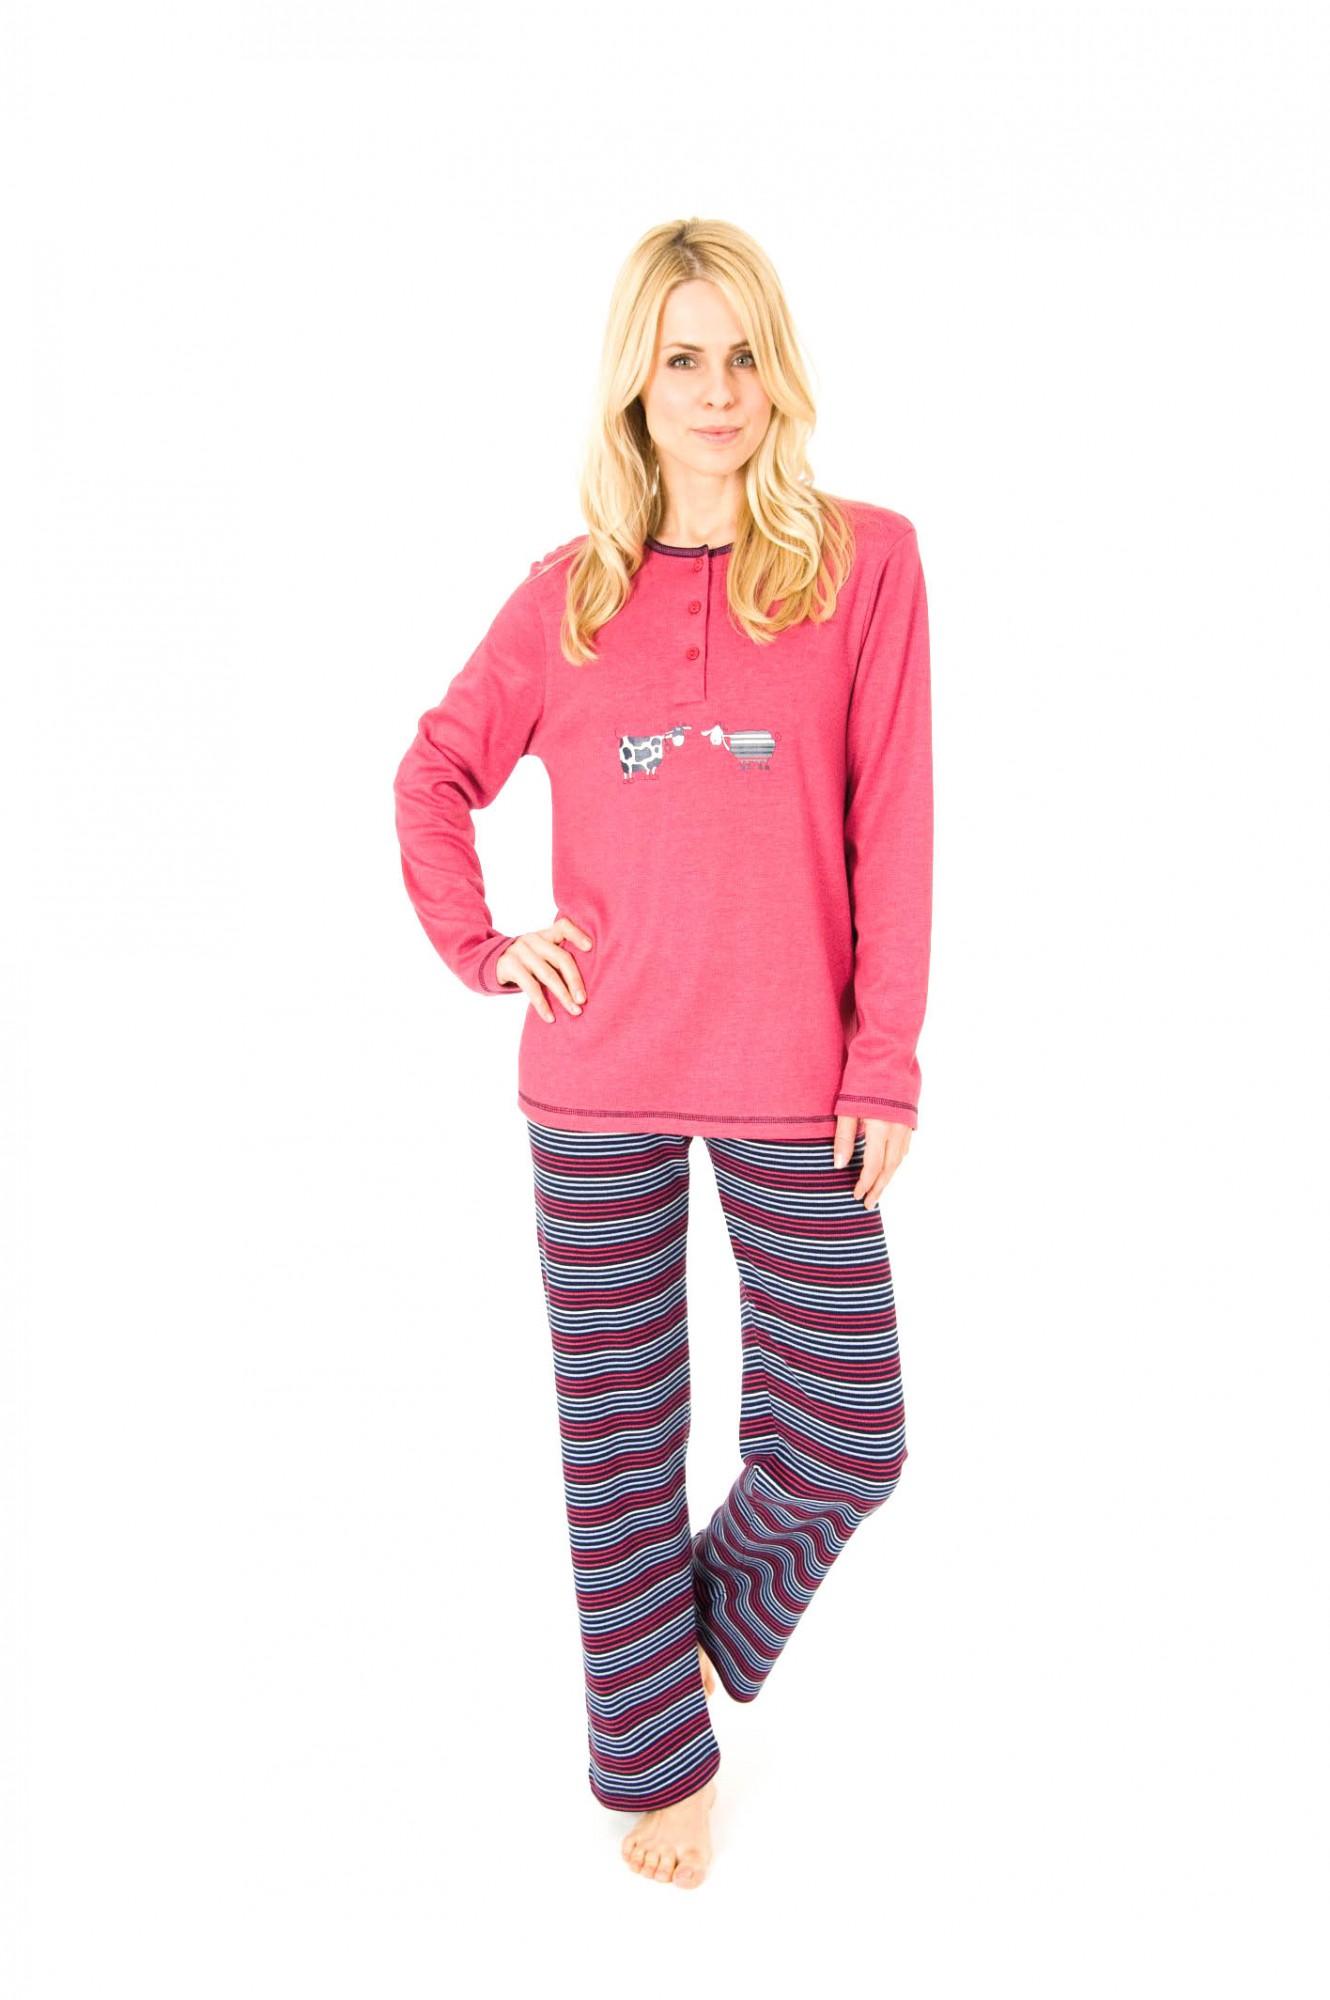 Pyjama langarm Kuschel Interlock - Hose geringelt 251 201 96 900 001